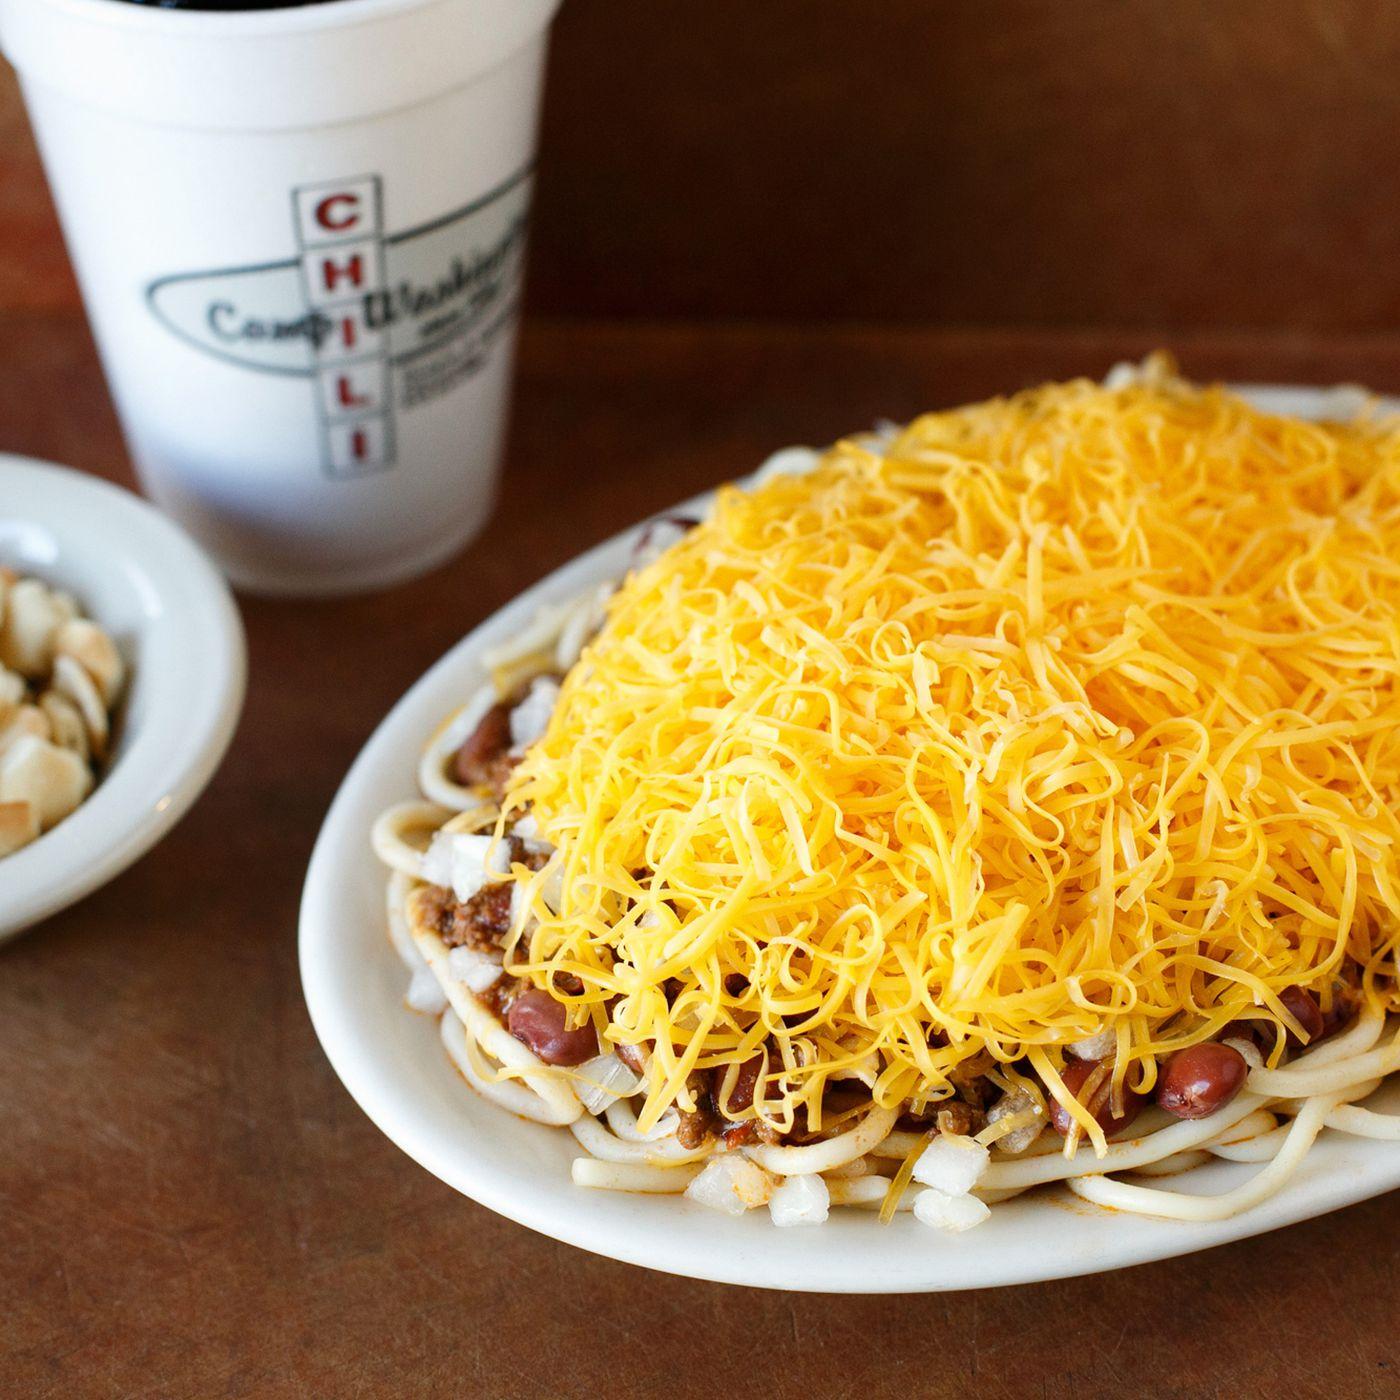 How Camp Washington S Chili Topped Spaghetti Became Cincinnati Legend Eater